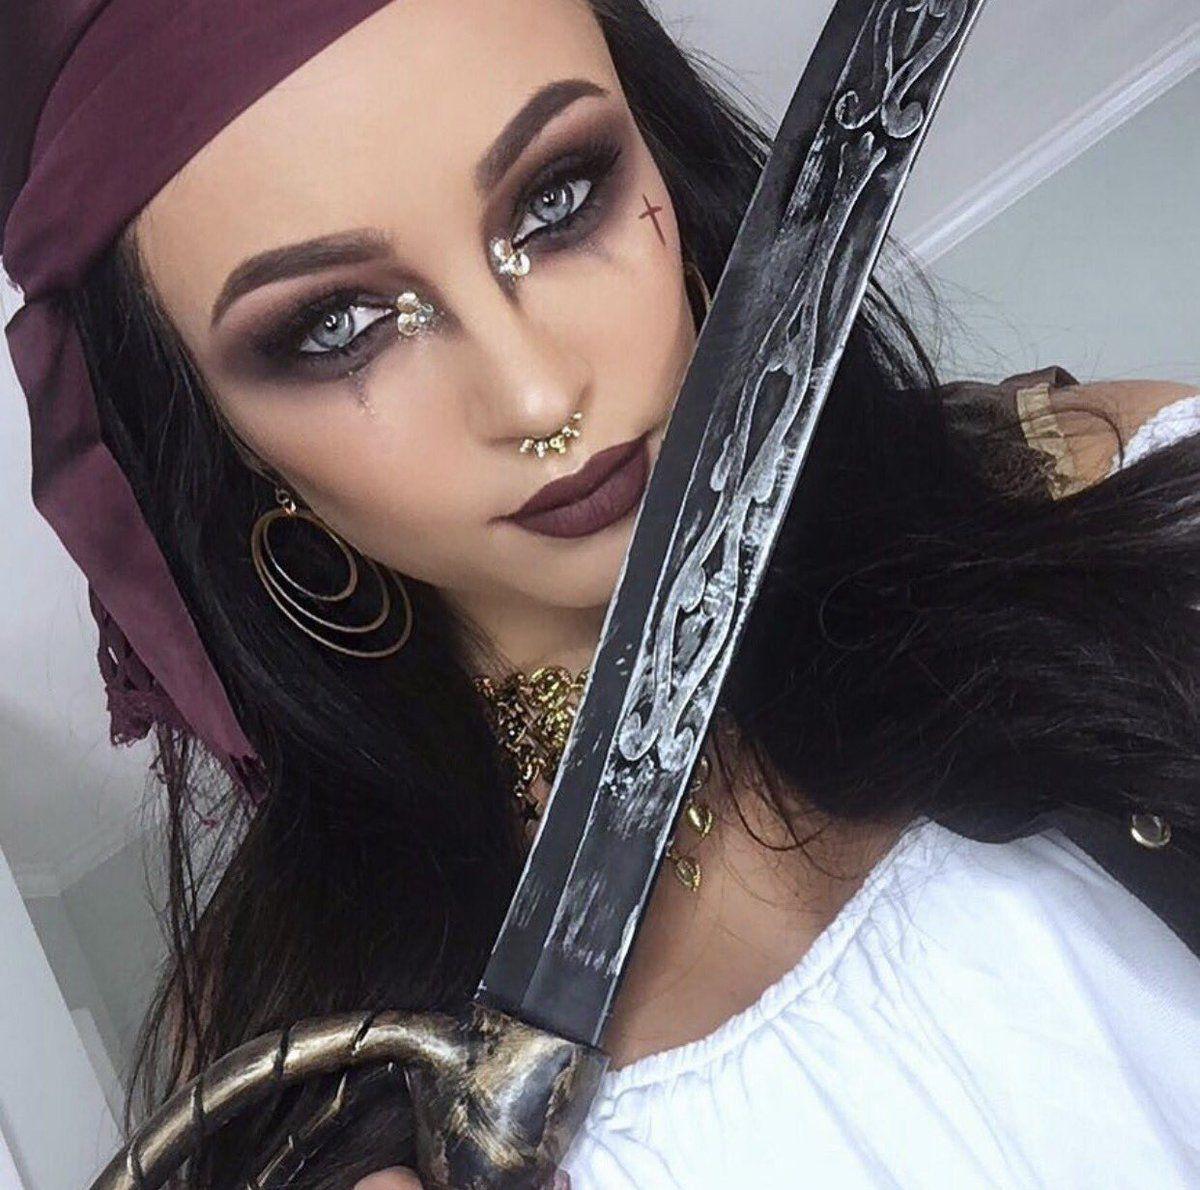 Image Result For Pirate Makeup Pirate Makeup Halloween Costumes Makeup Pirate Halloween Costumes